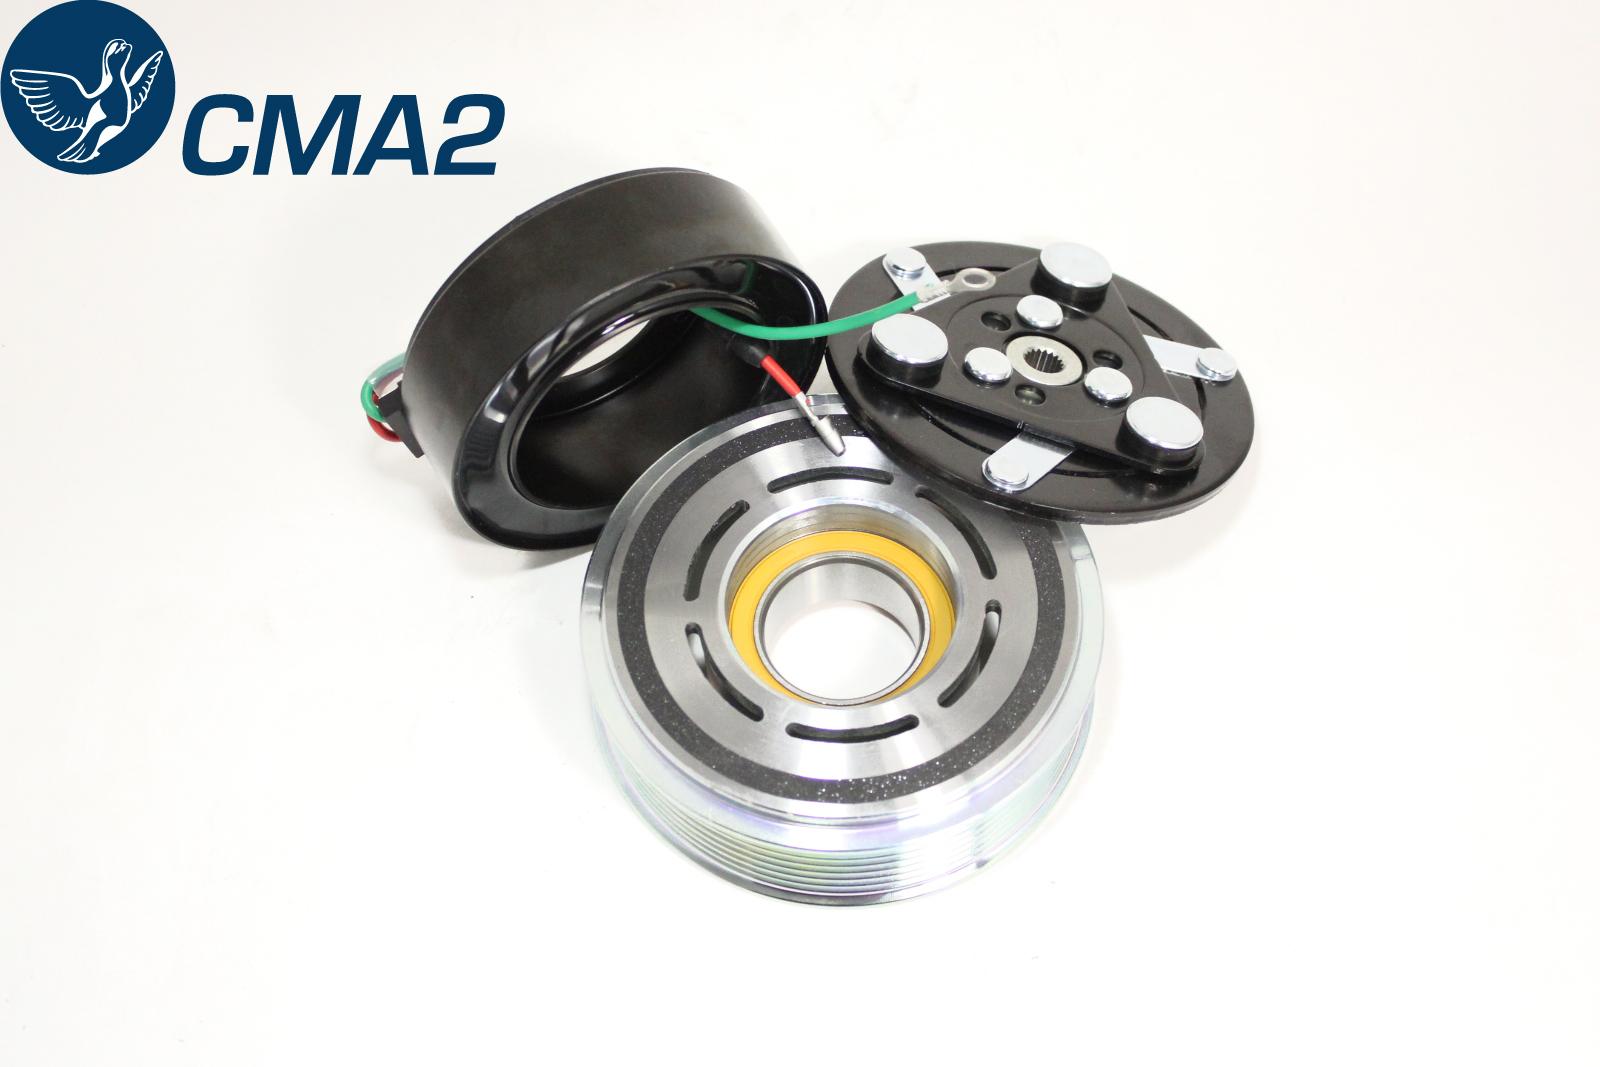 Муфта компрессора кондиционера Хонда Аккорд 8 CU 2.0, 38900-R60-W01 38924-R60-W01 38900R60W01 38924R60W01